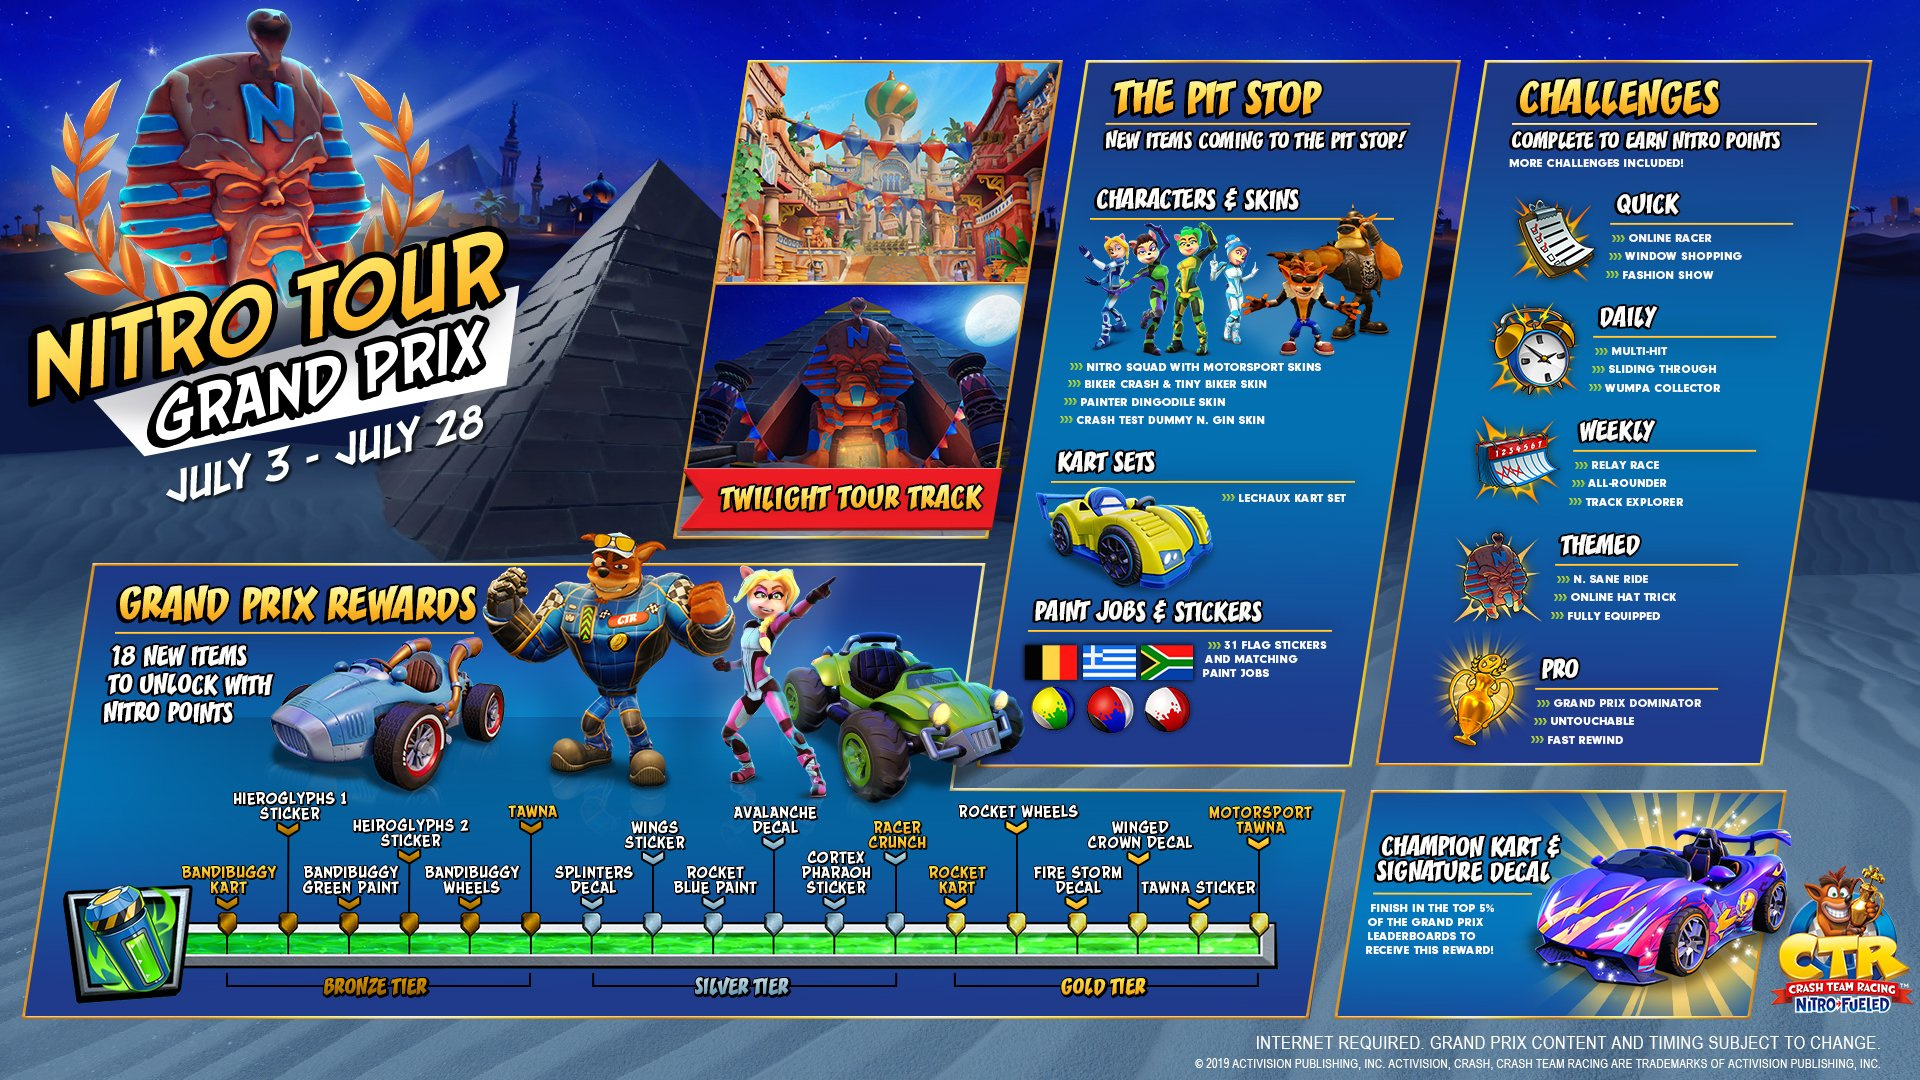 The Nitro Tour Grand Prix Event Is Live Now in Crash Team